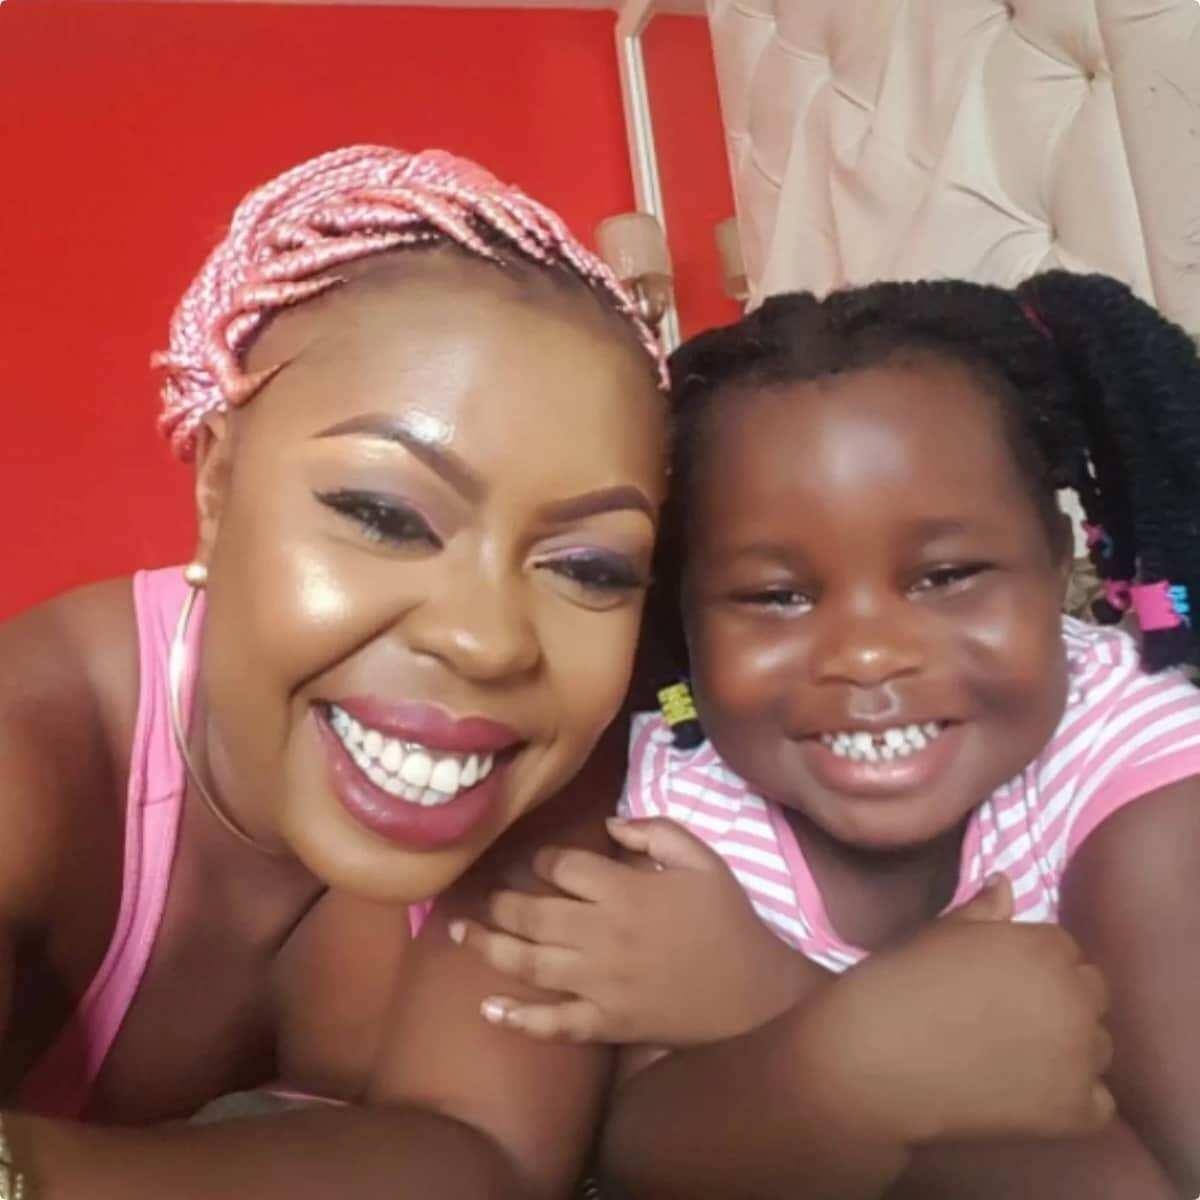 Afia Schwar's daughter thanks Ghanaians for voting for her mother